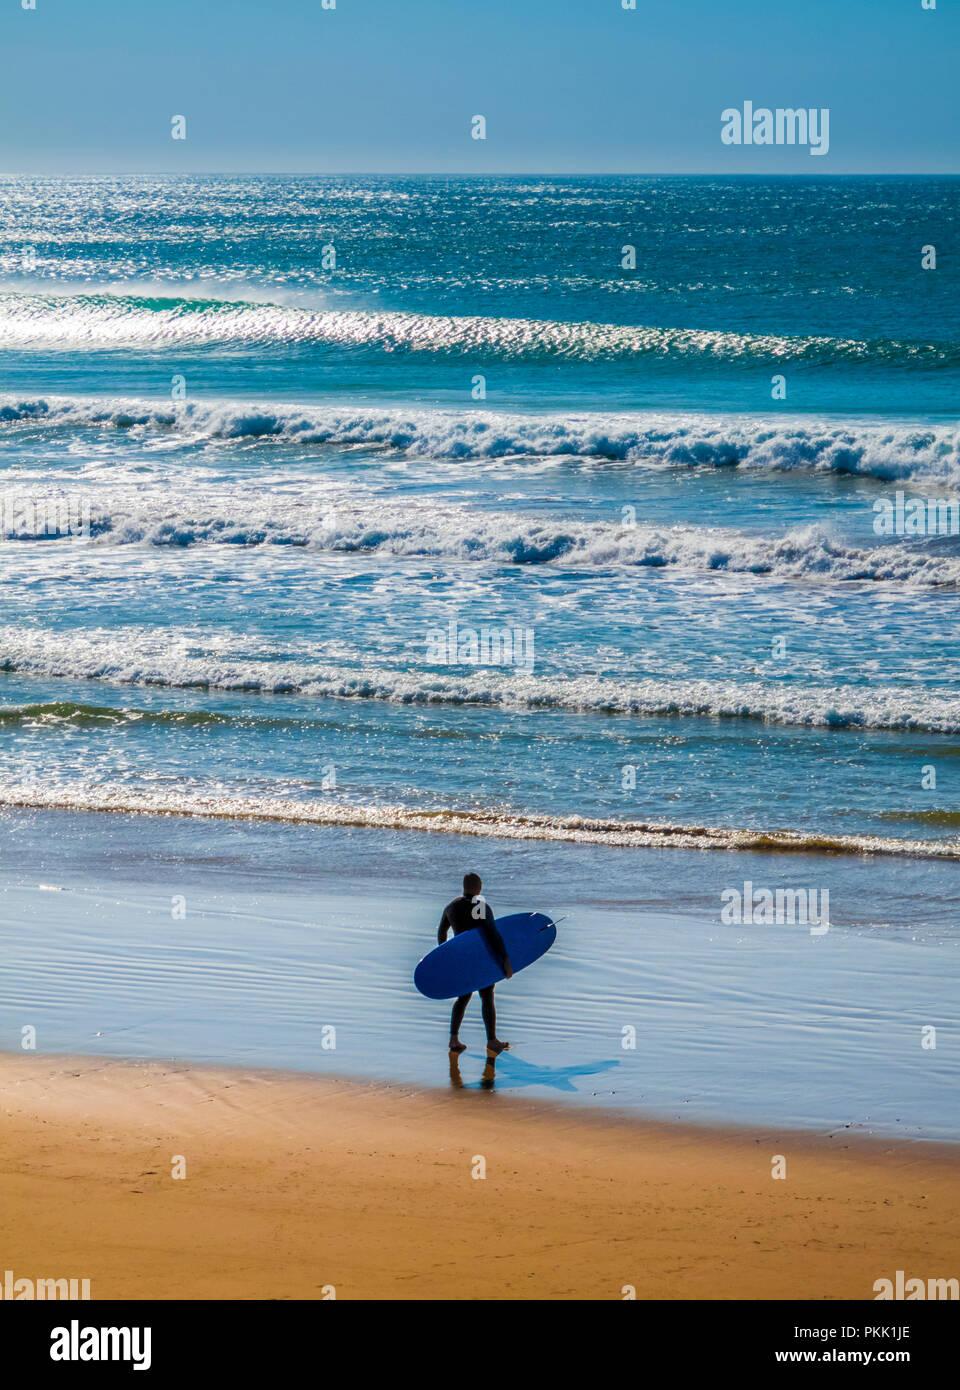 Silhouette der Surfer in der Brandung. Stockbild